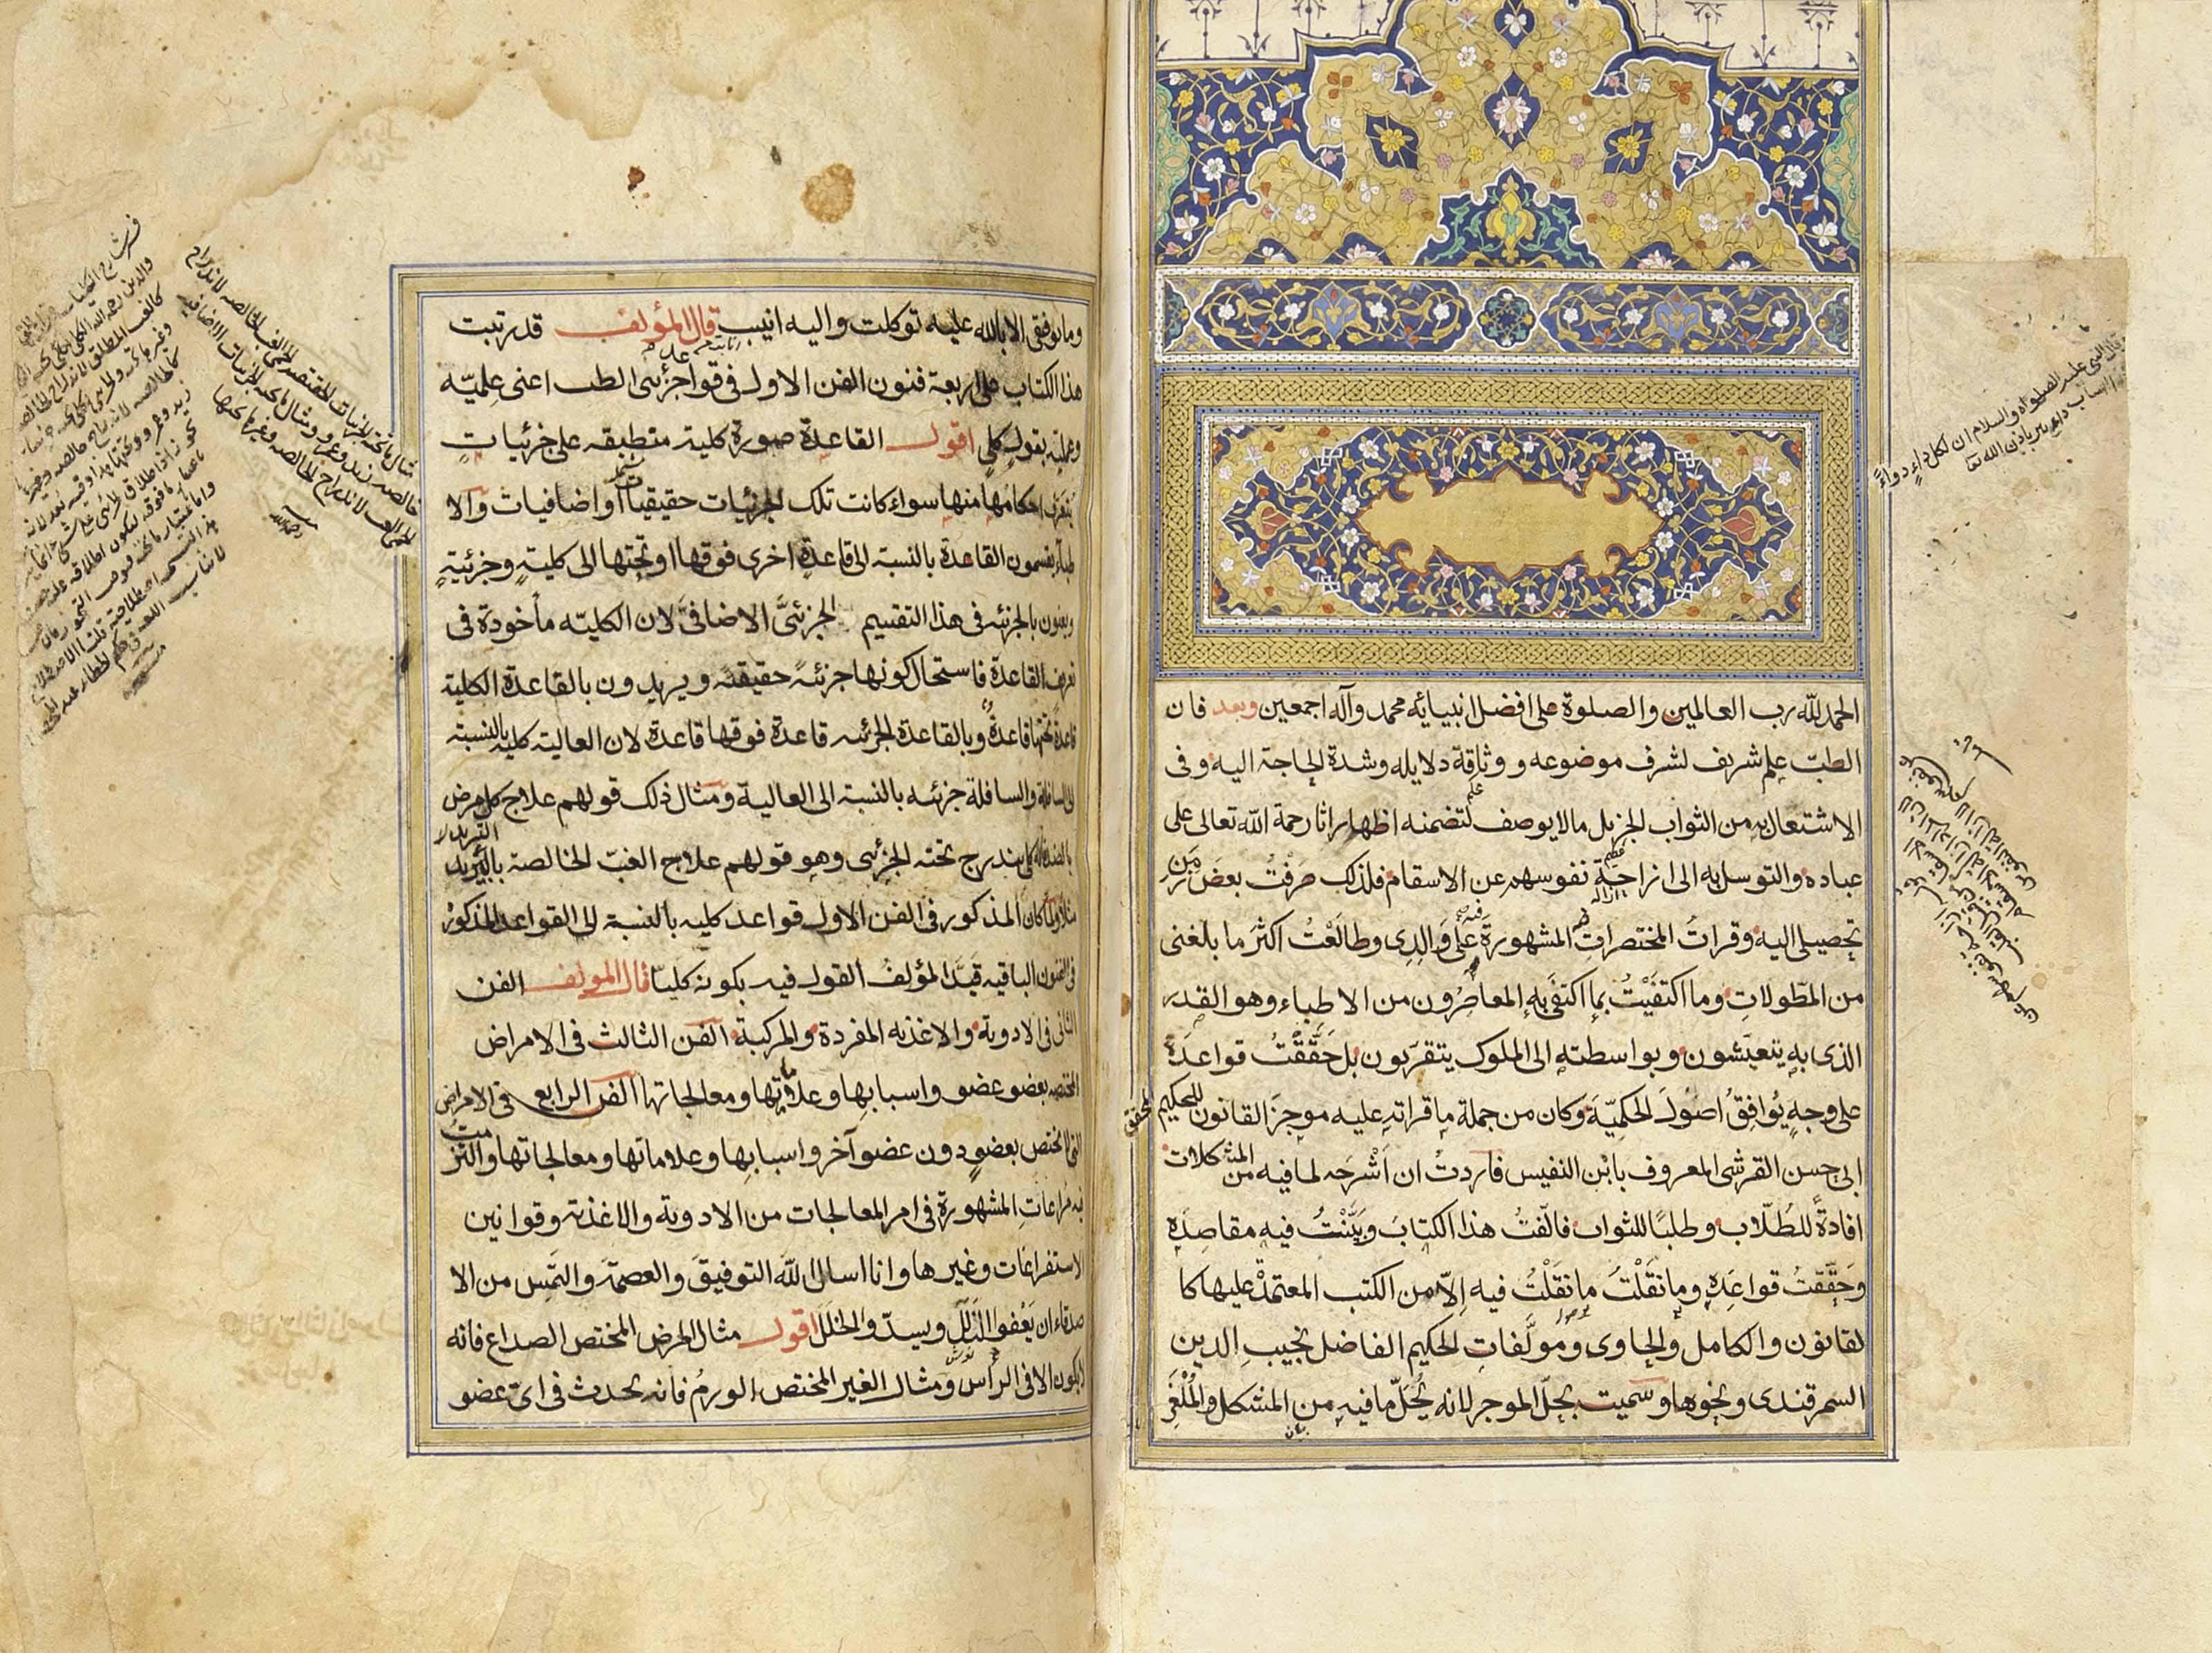 JAMAL AL-DIN MUHAMMAD BIN MUHA